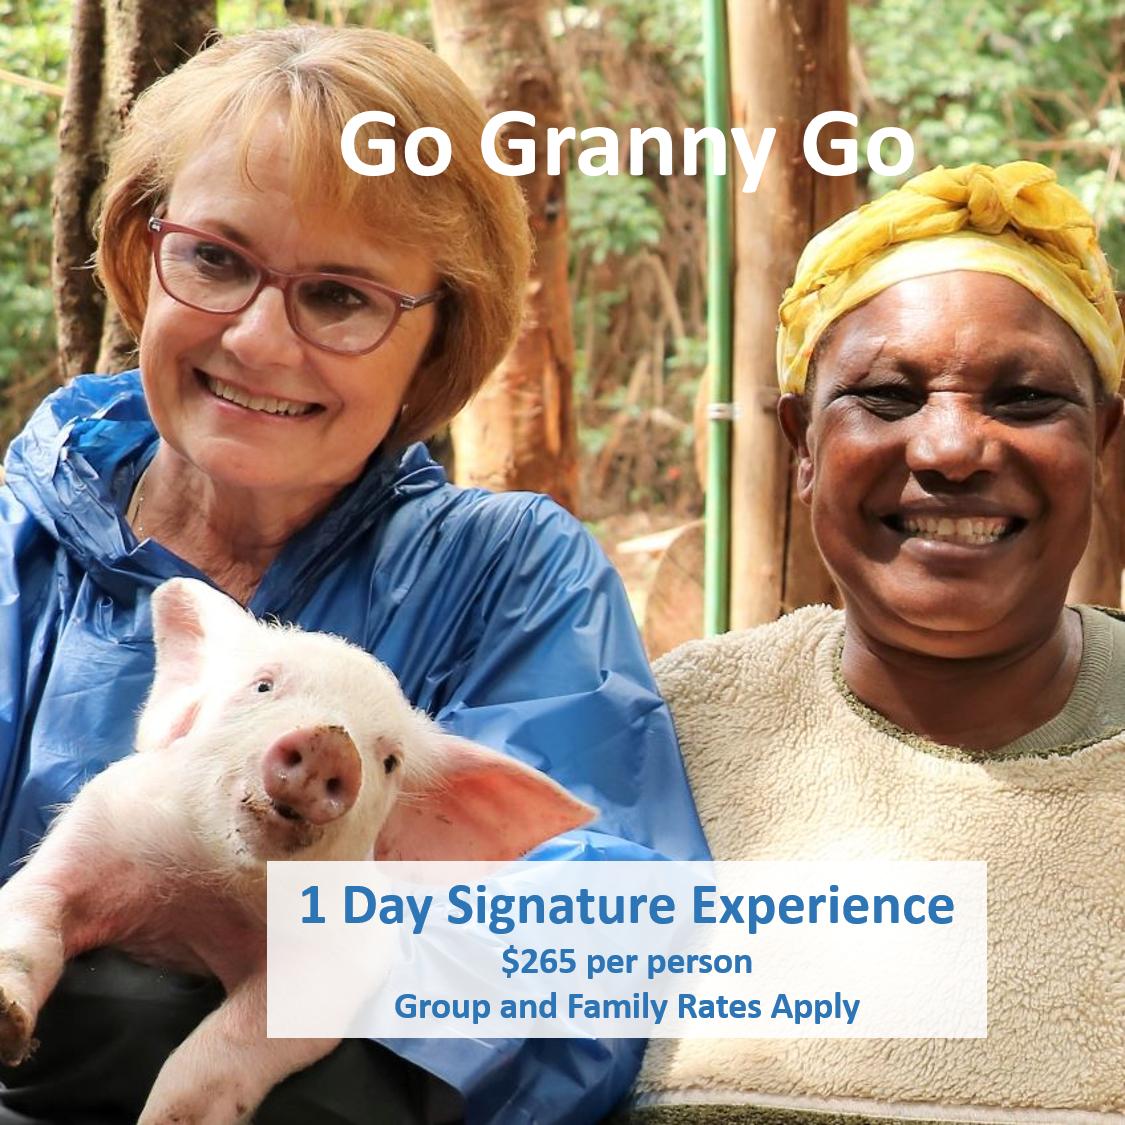 GO GRANNY GO – 1 DAY SIGNATURE EXPERIENCE